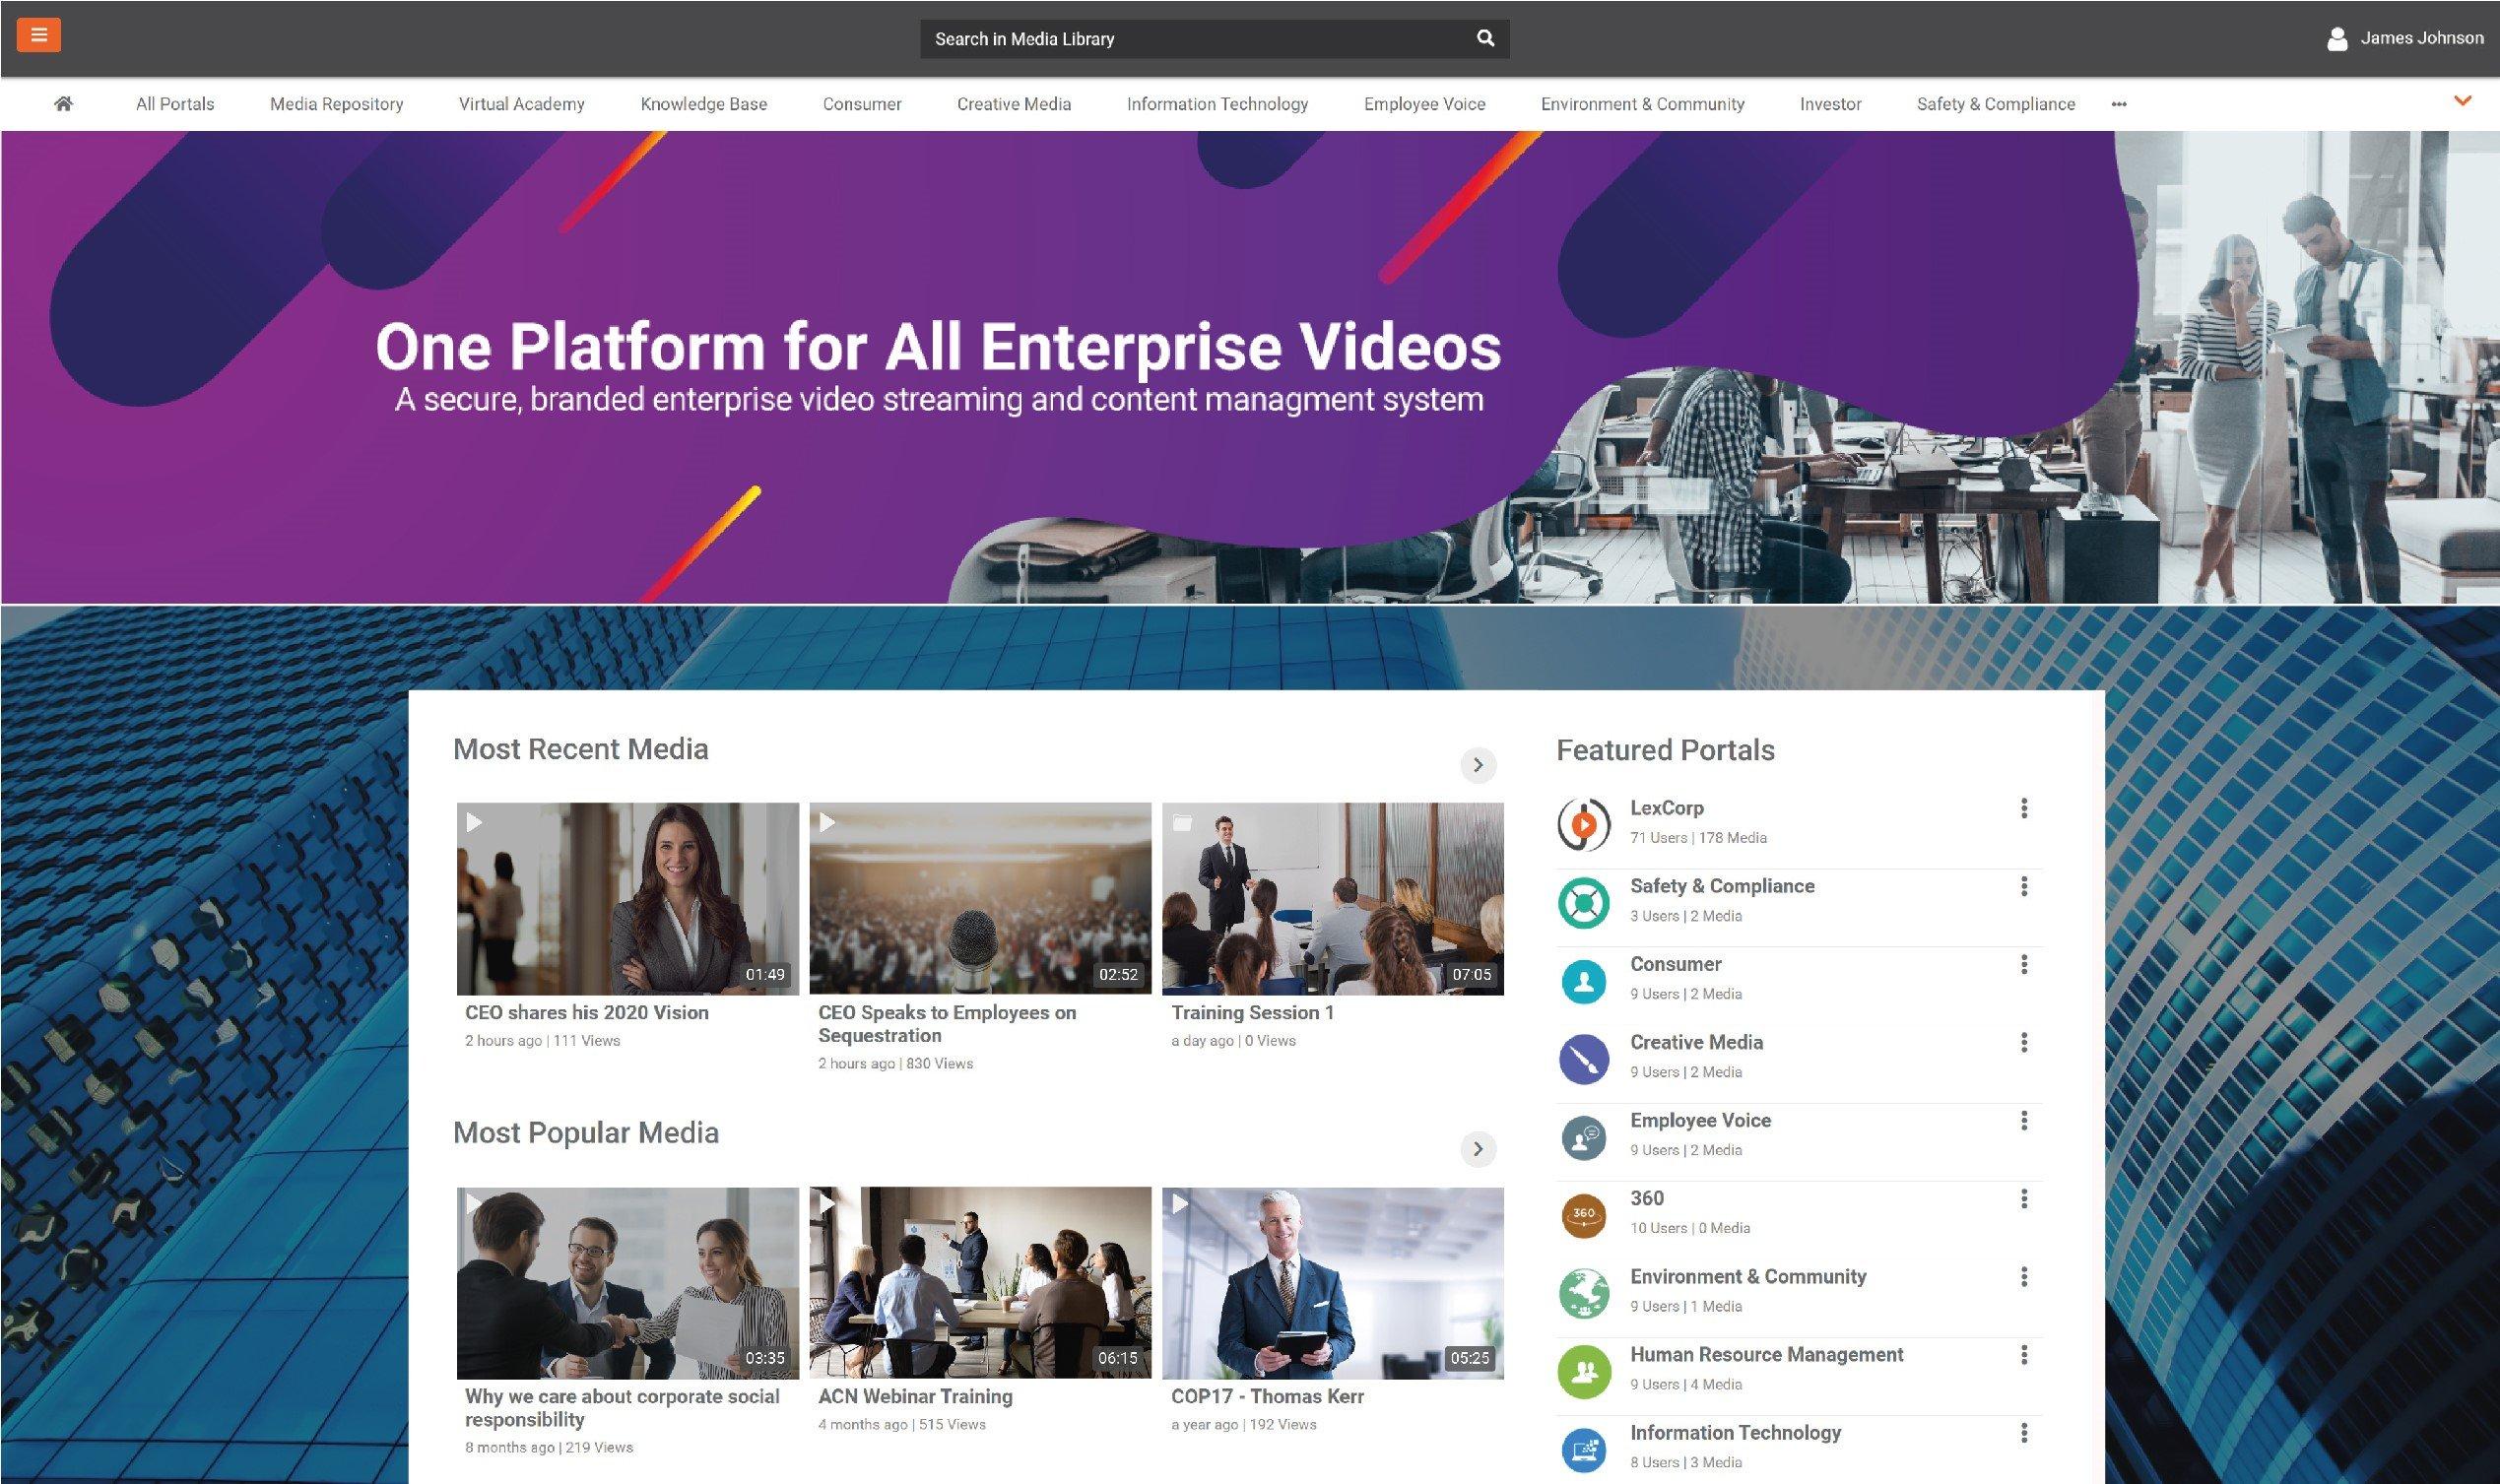 End-to-end brandable enterprise video platform